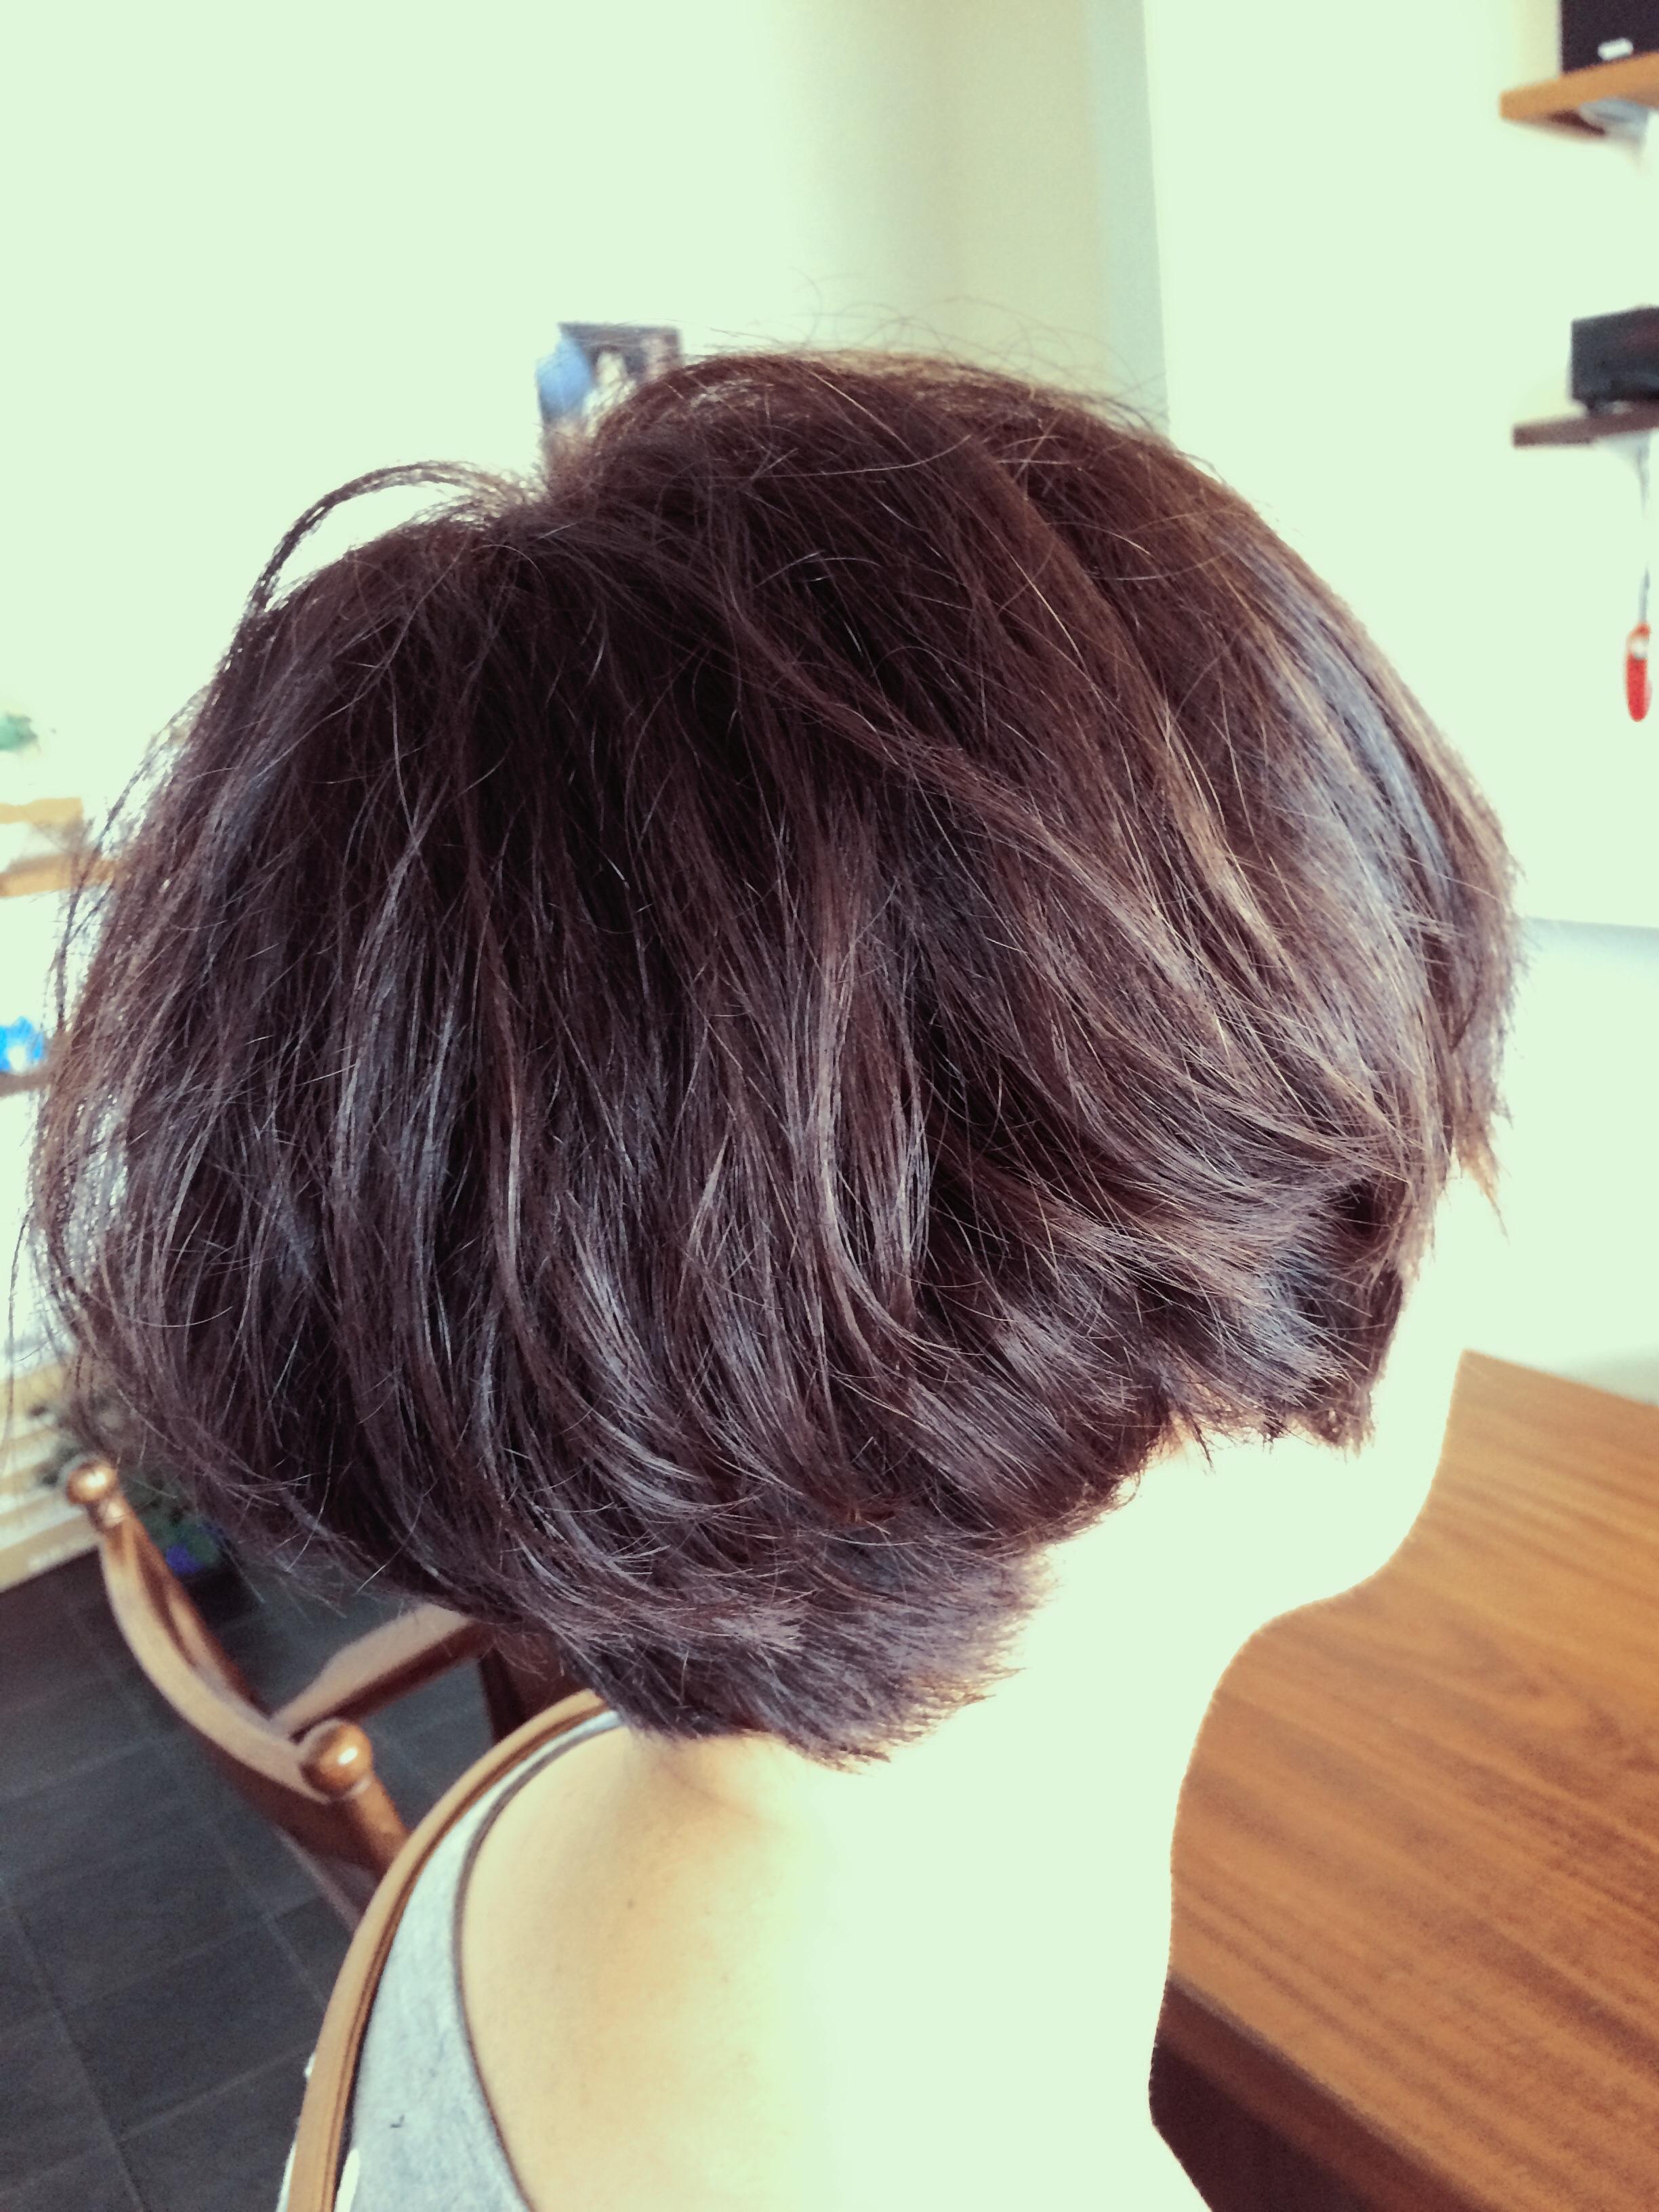 fc2blog_201707251331110eb.jpg